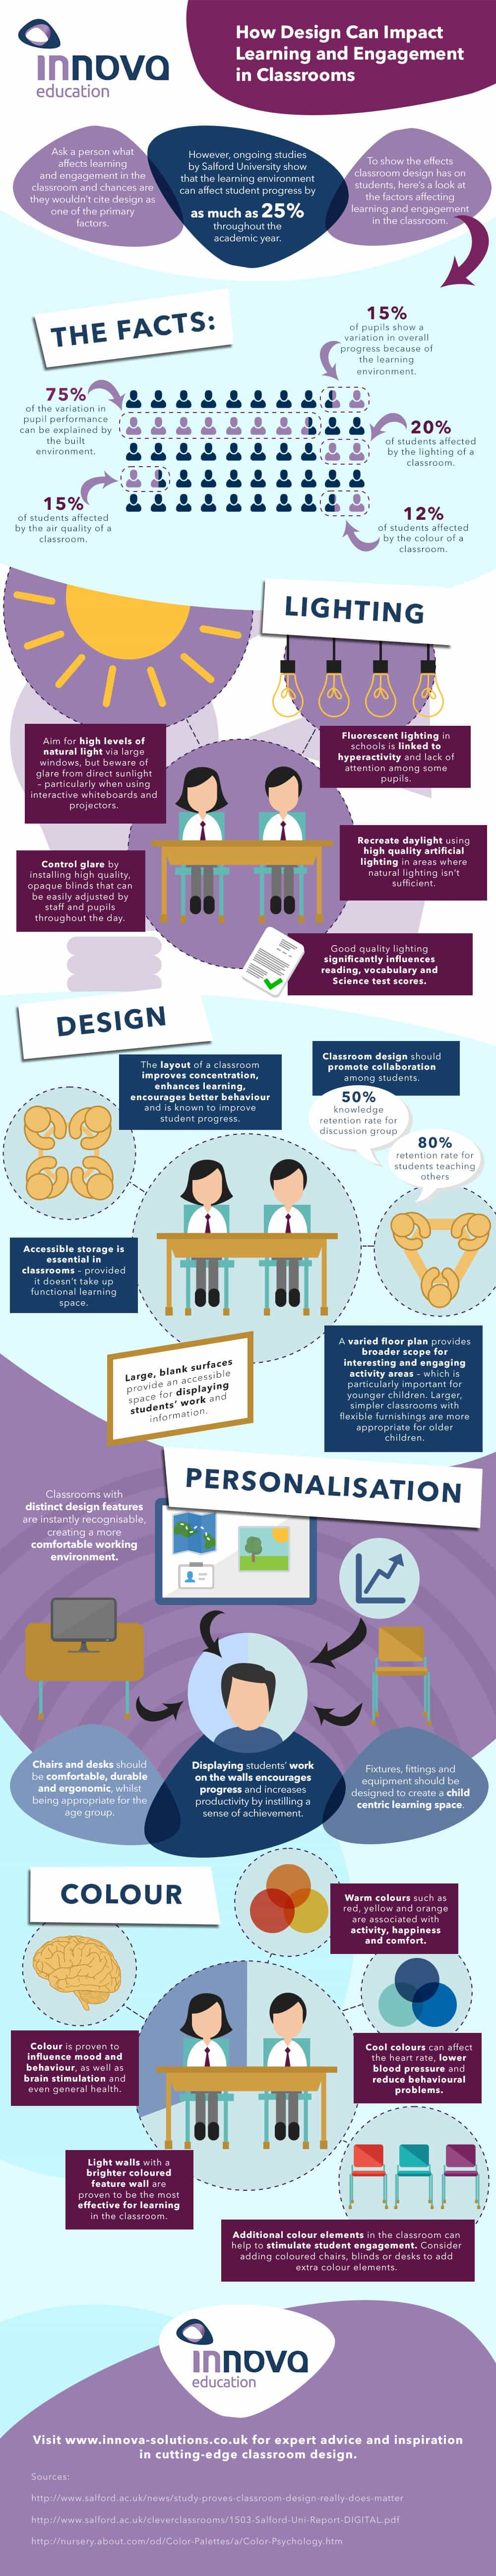 innova-design-infographic-purple-FINAL